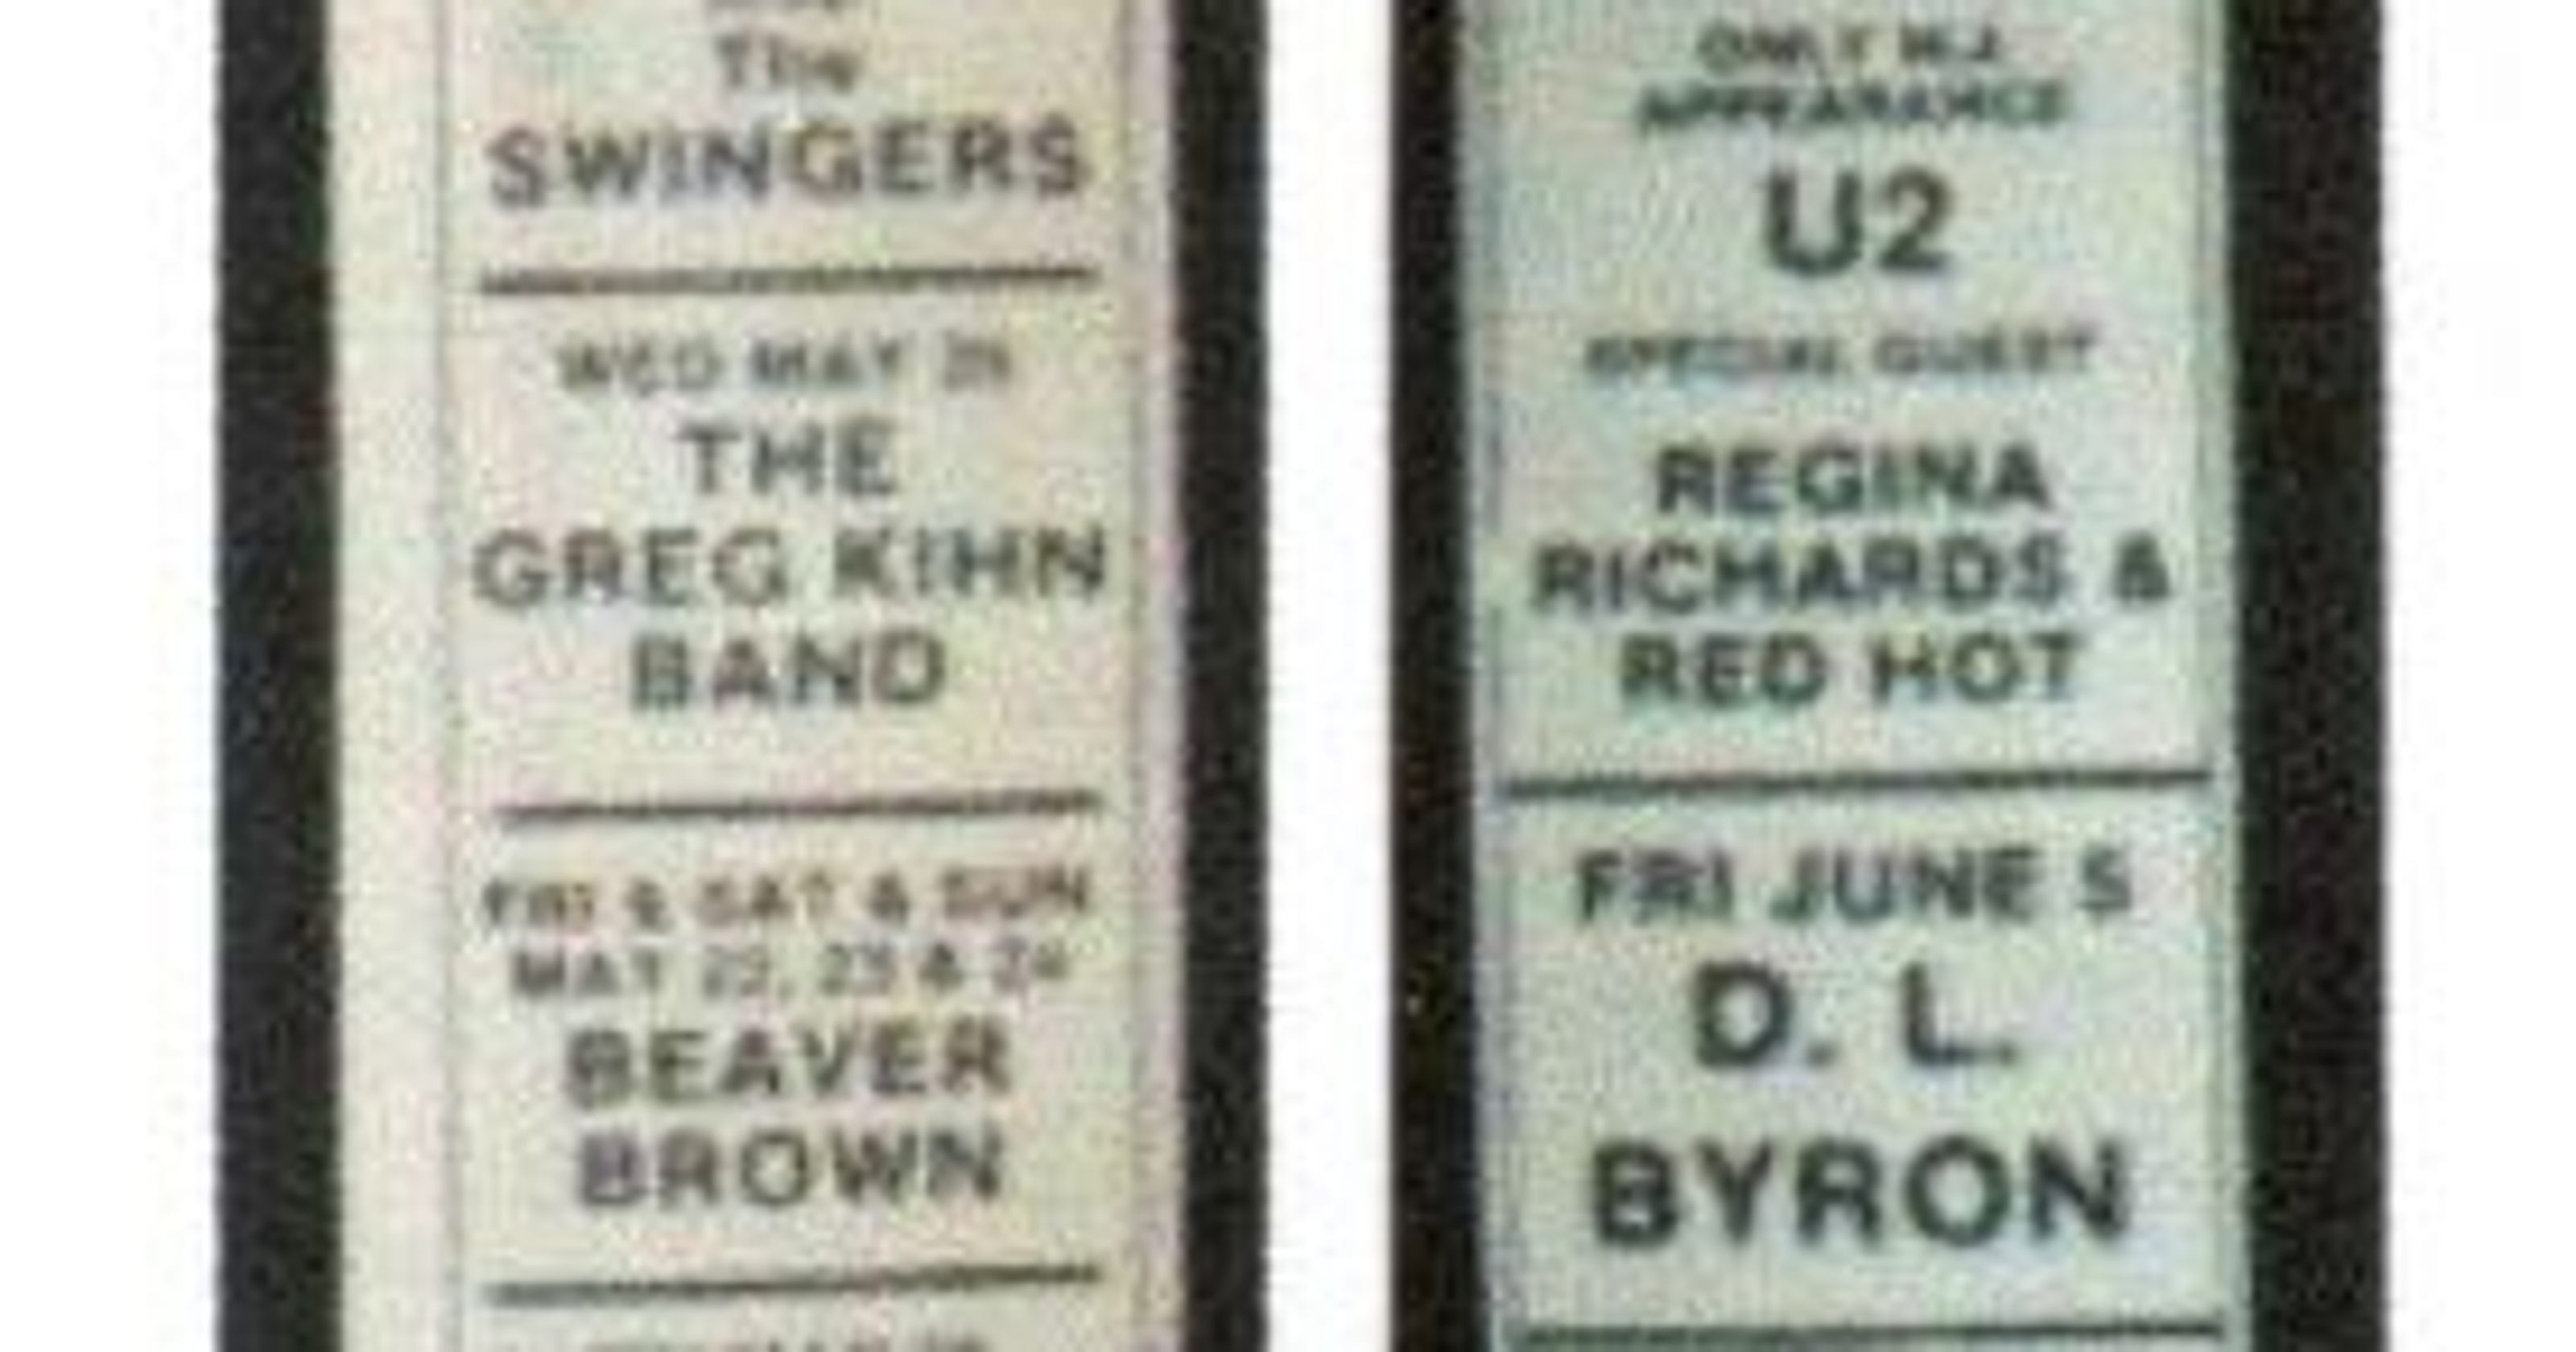 U2 played twice at this legendary Asbury Park club